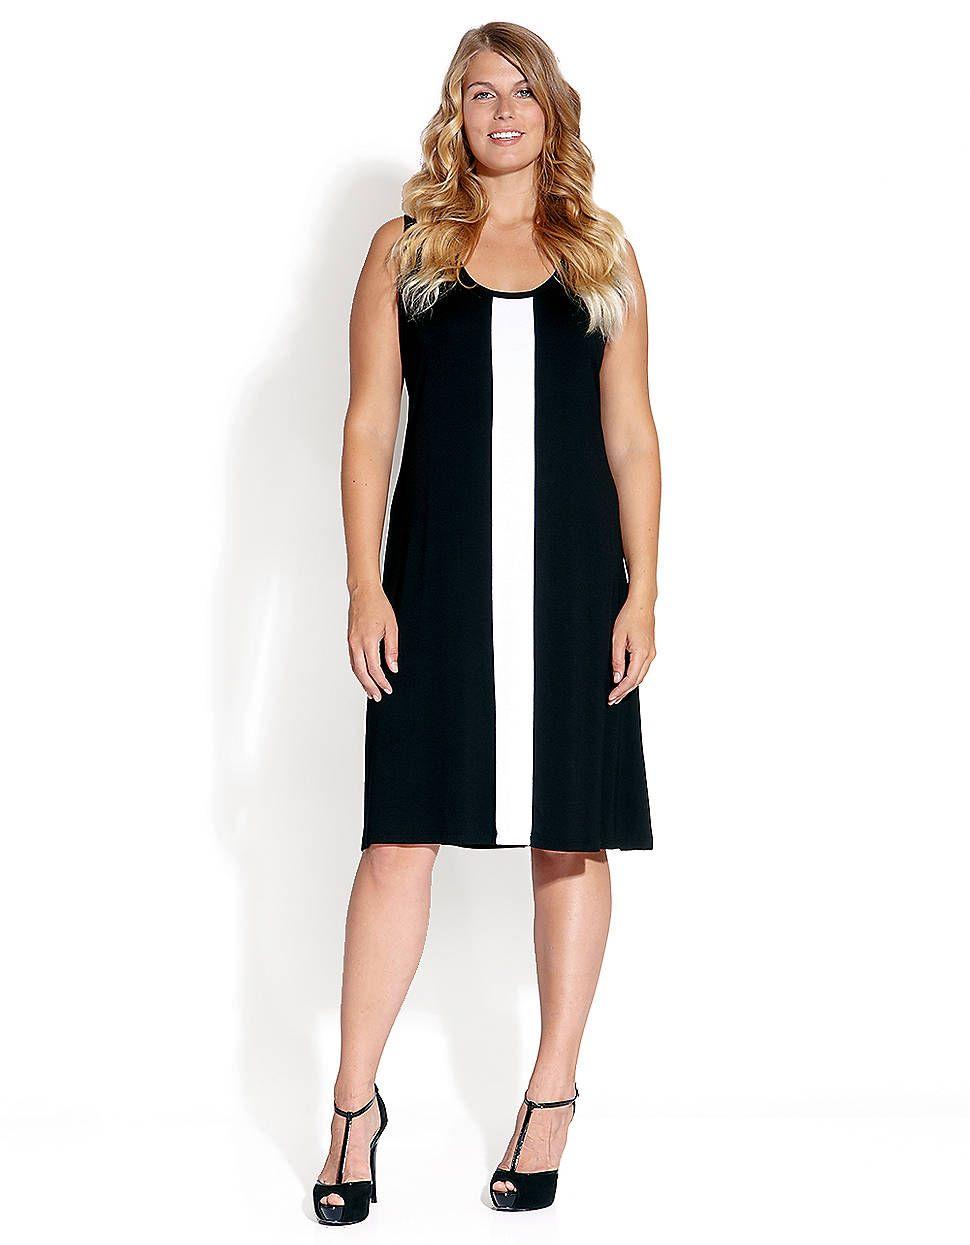 b648a919022 Plus Plus-Size Sleeveless Contrast Dress